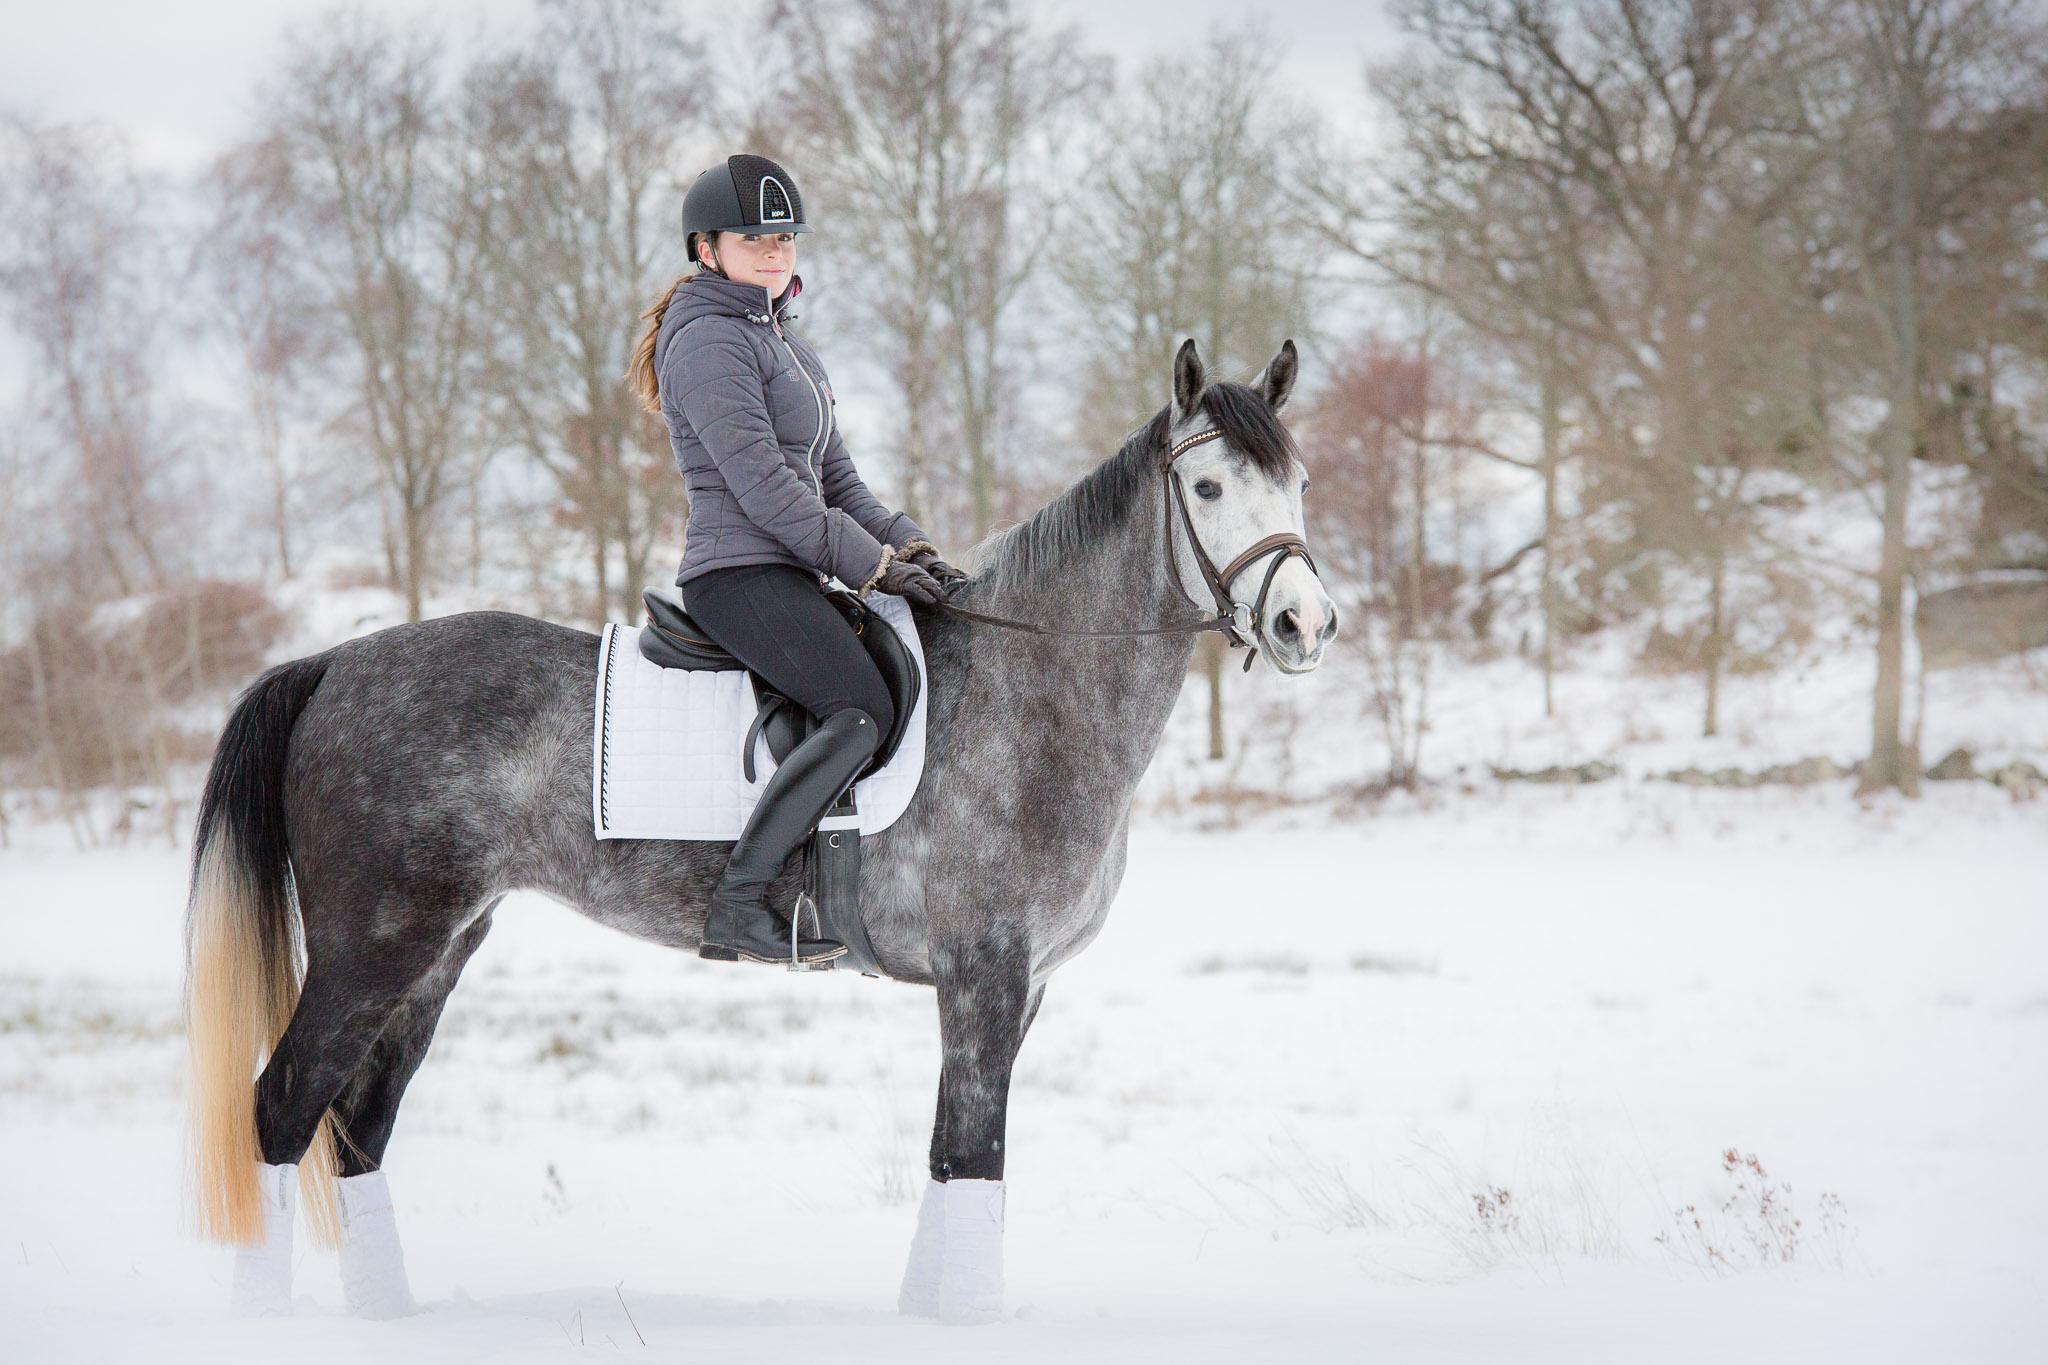 Annatarfoto Ebbadressage Ebba Nilsson Ella Torkö Ronneby hästfotografering